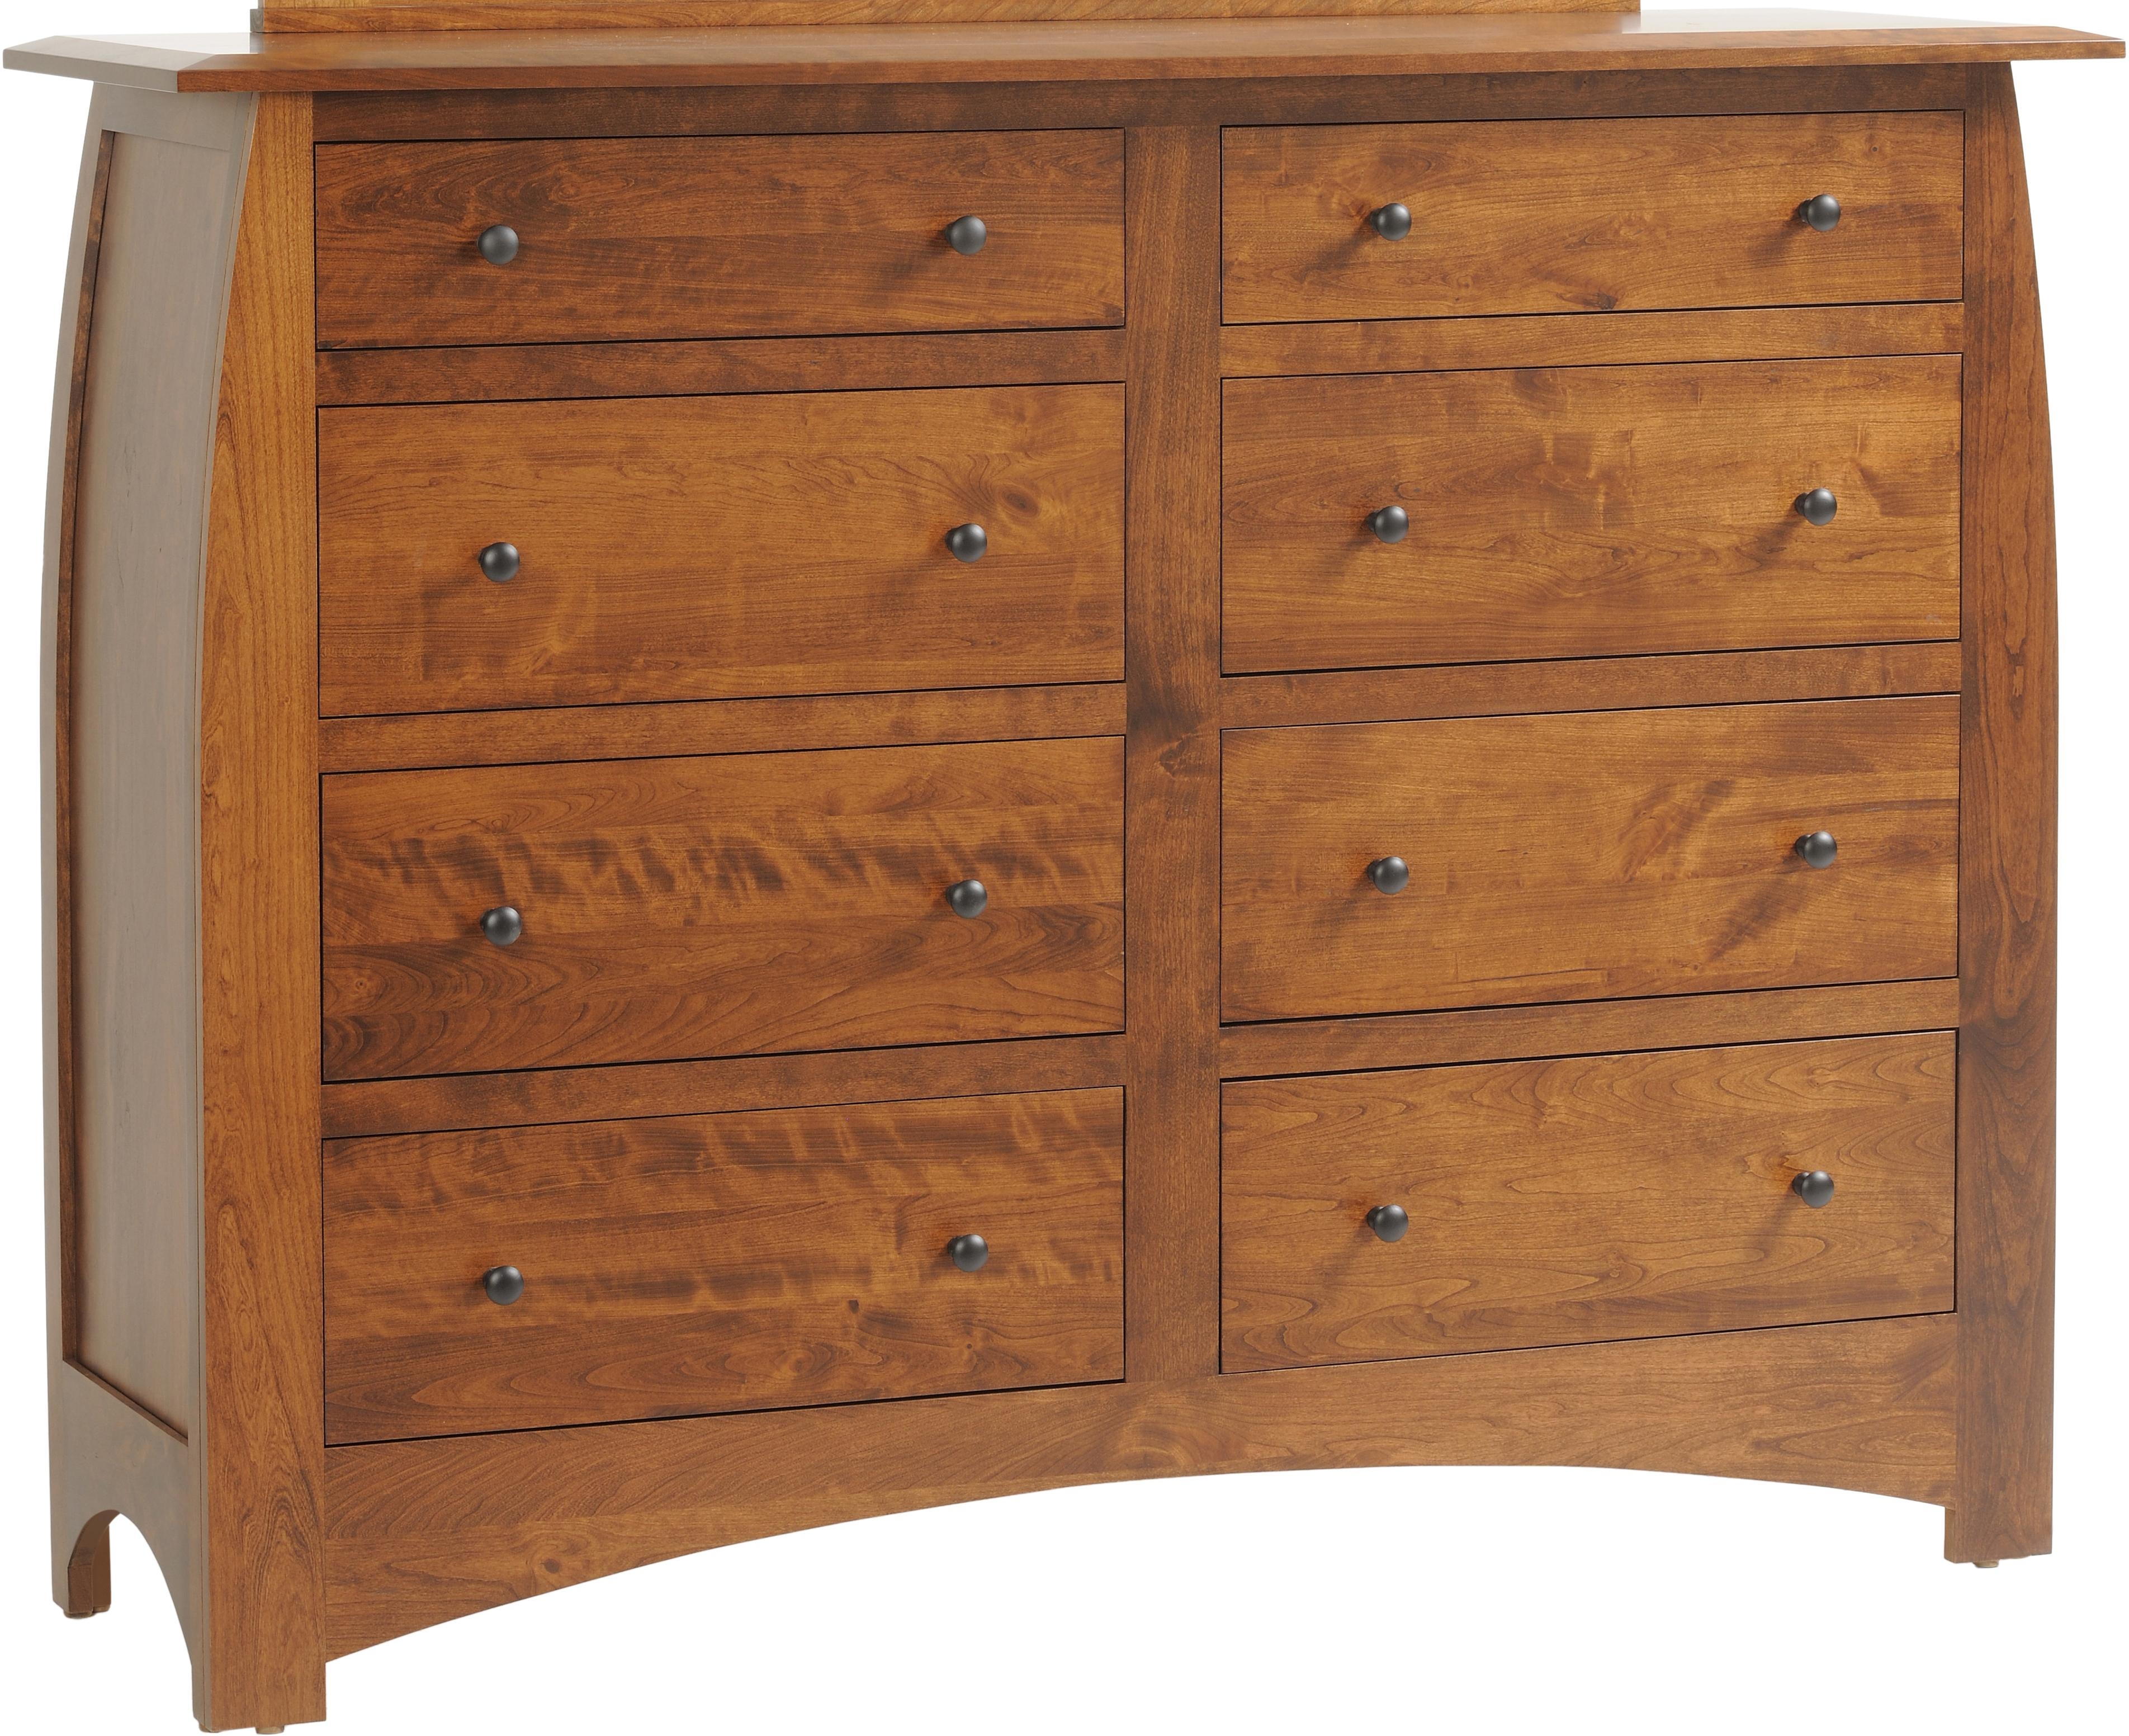 Bordeaux High Dresser by Millcraft at Saugerties Furniture Mart